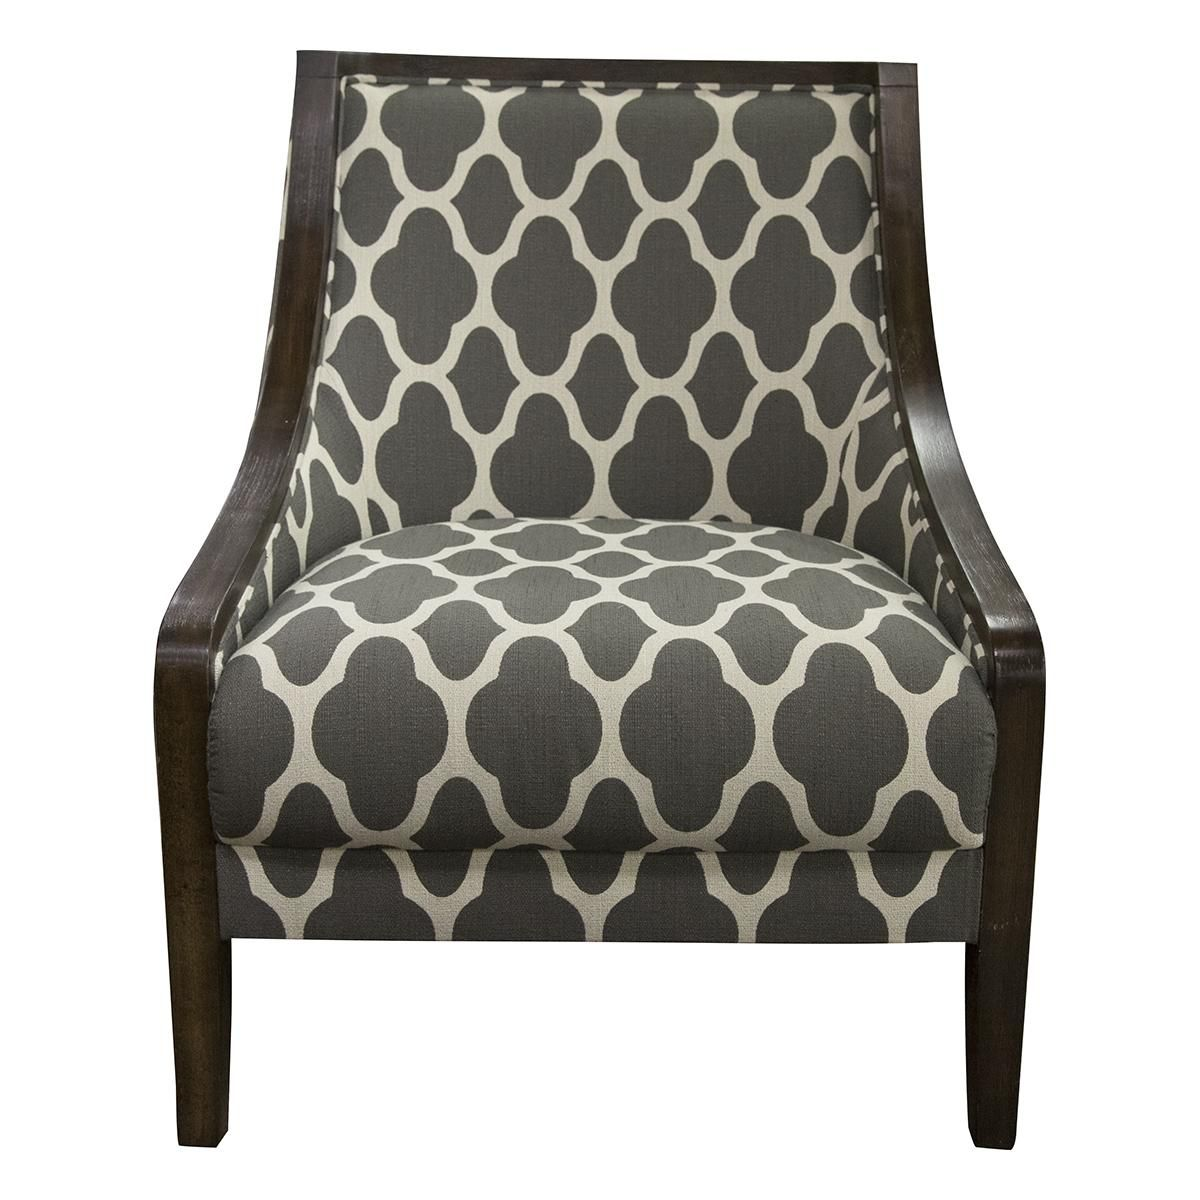 Interlochen Contemporary Accent Chair In Gray